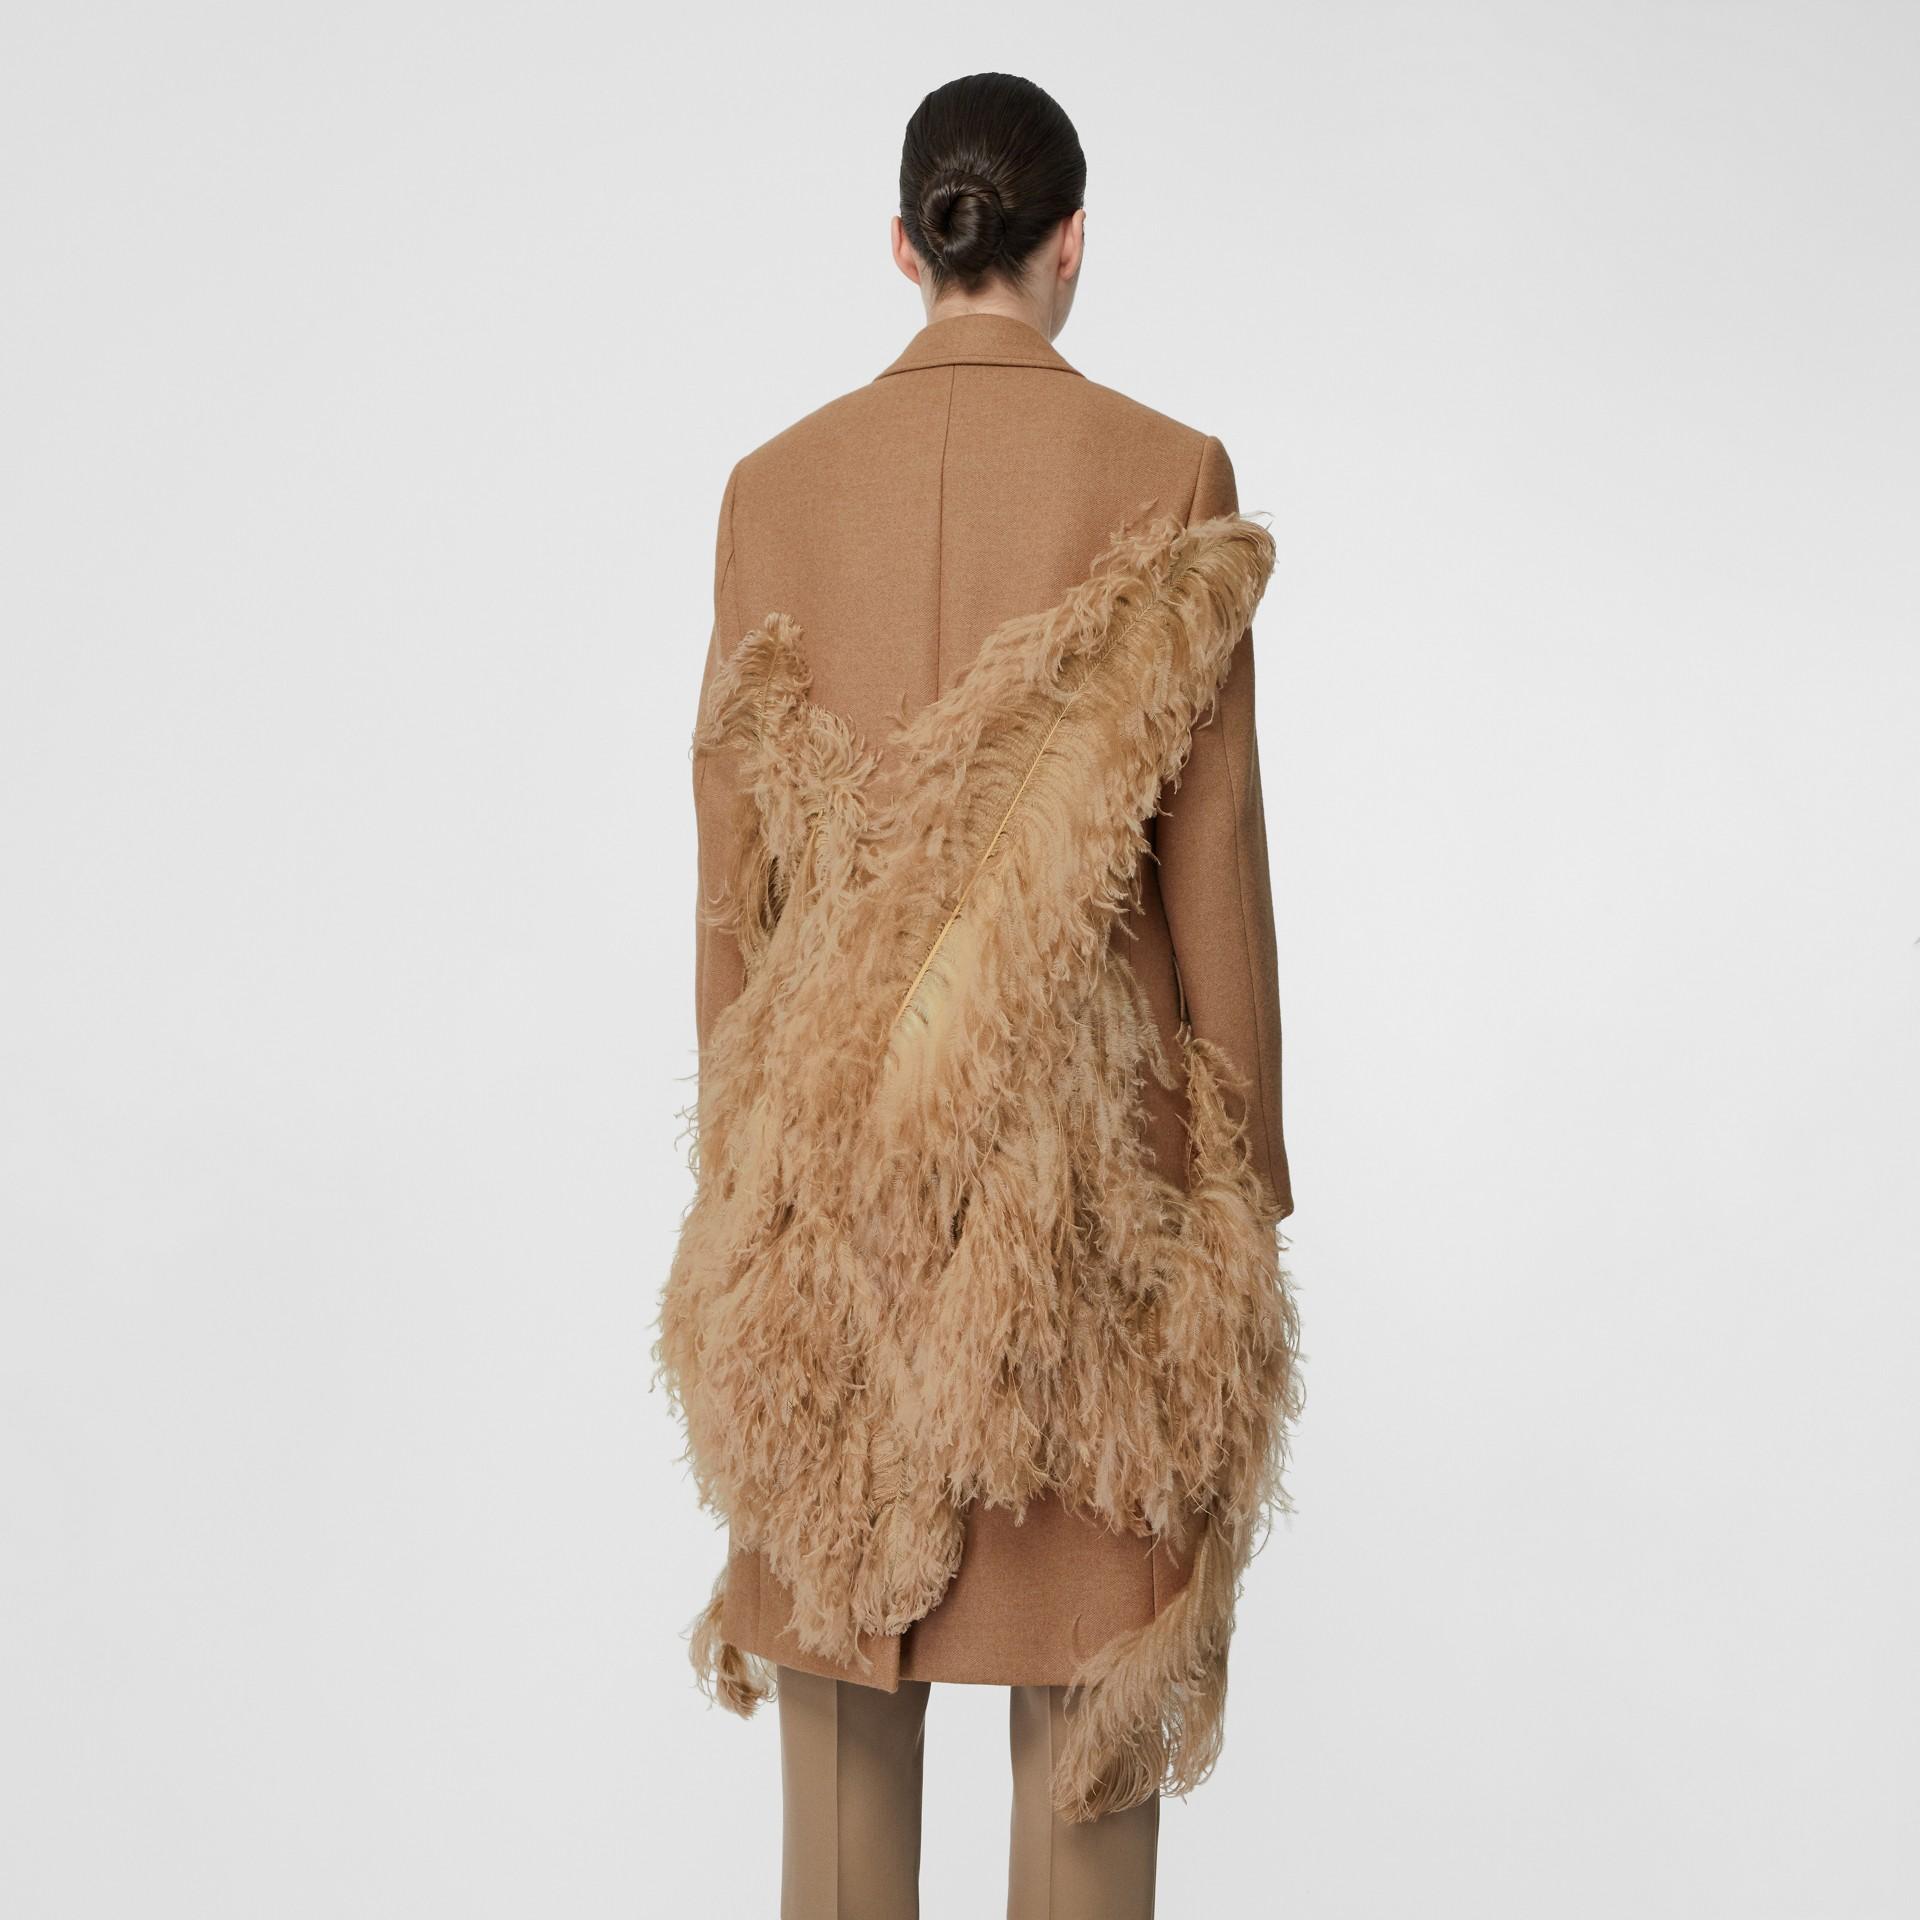 Abrigo de vestir en pelo de camello con detalle de plumas (Cámel) - Mujer | Burberry - imagen de la galería 2